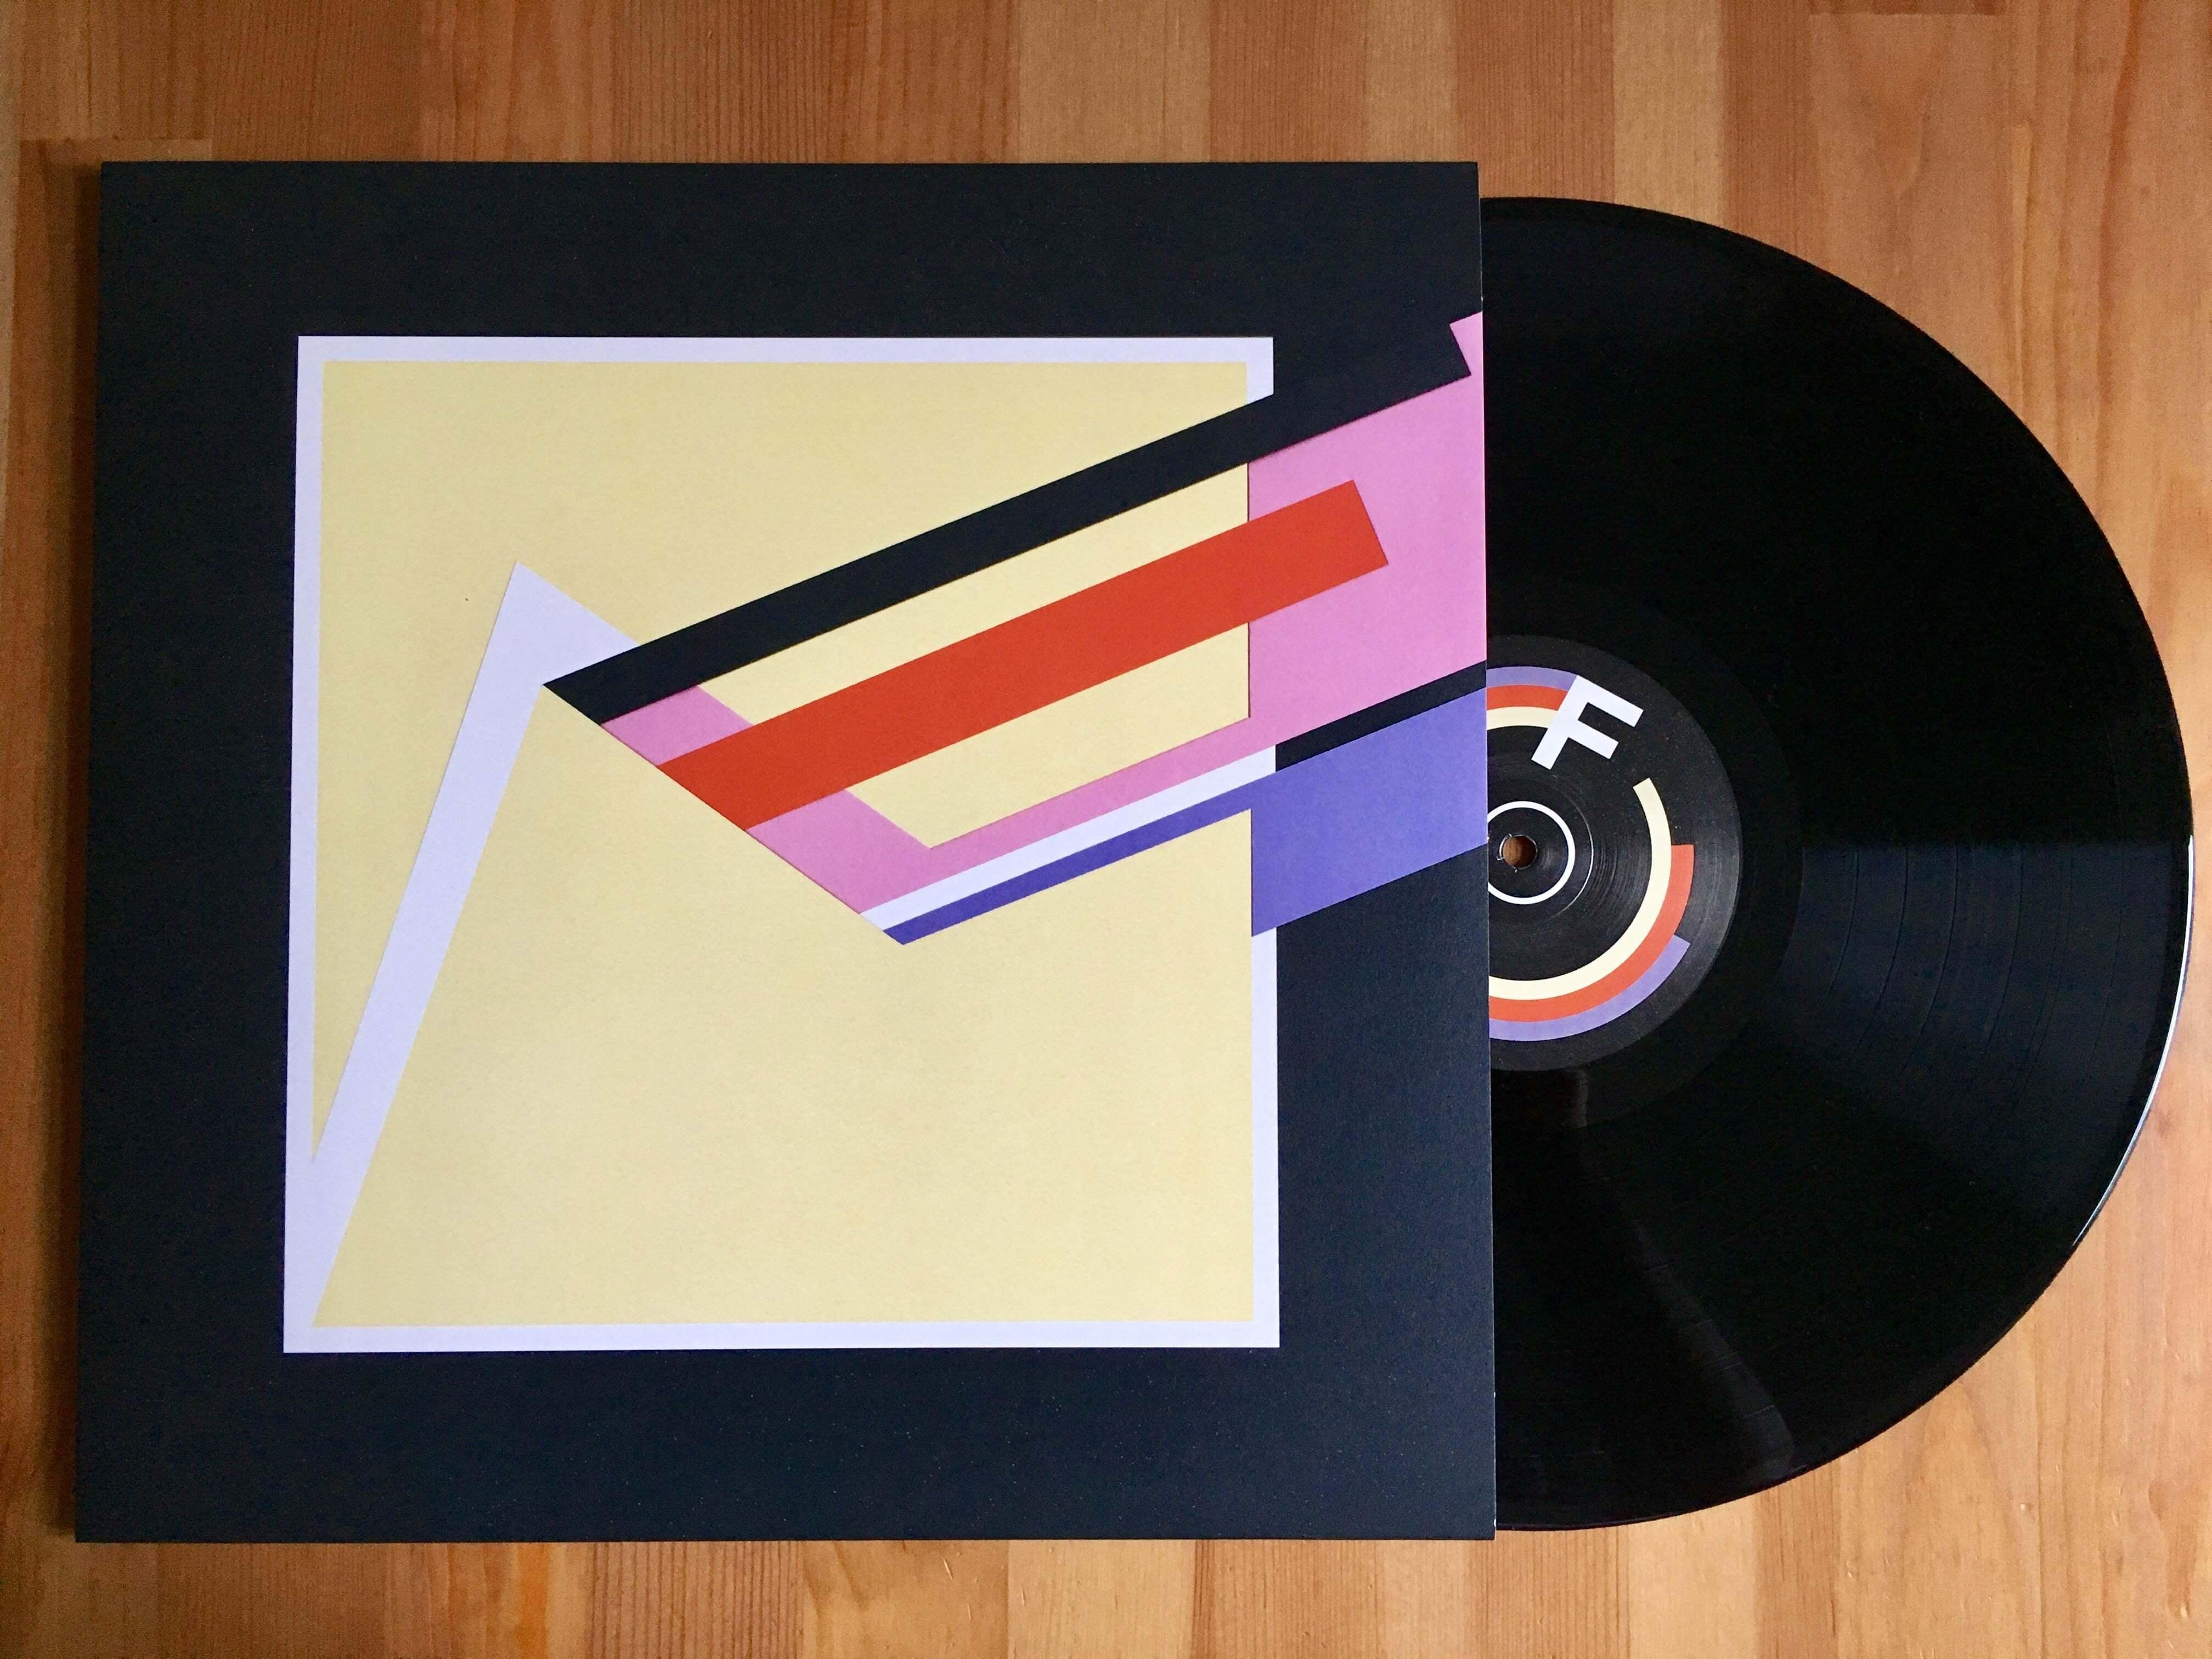 dEnk & Drumtomski - Fusions 1